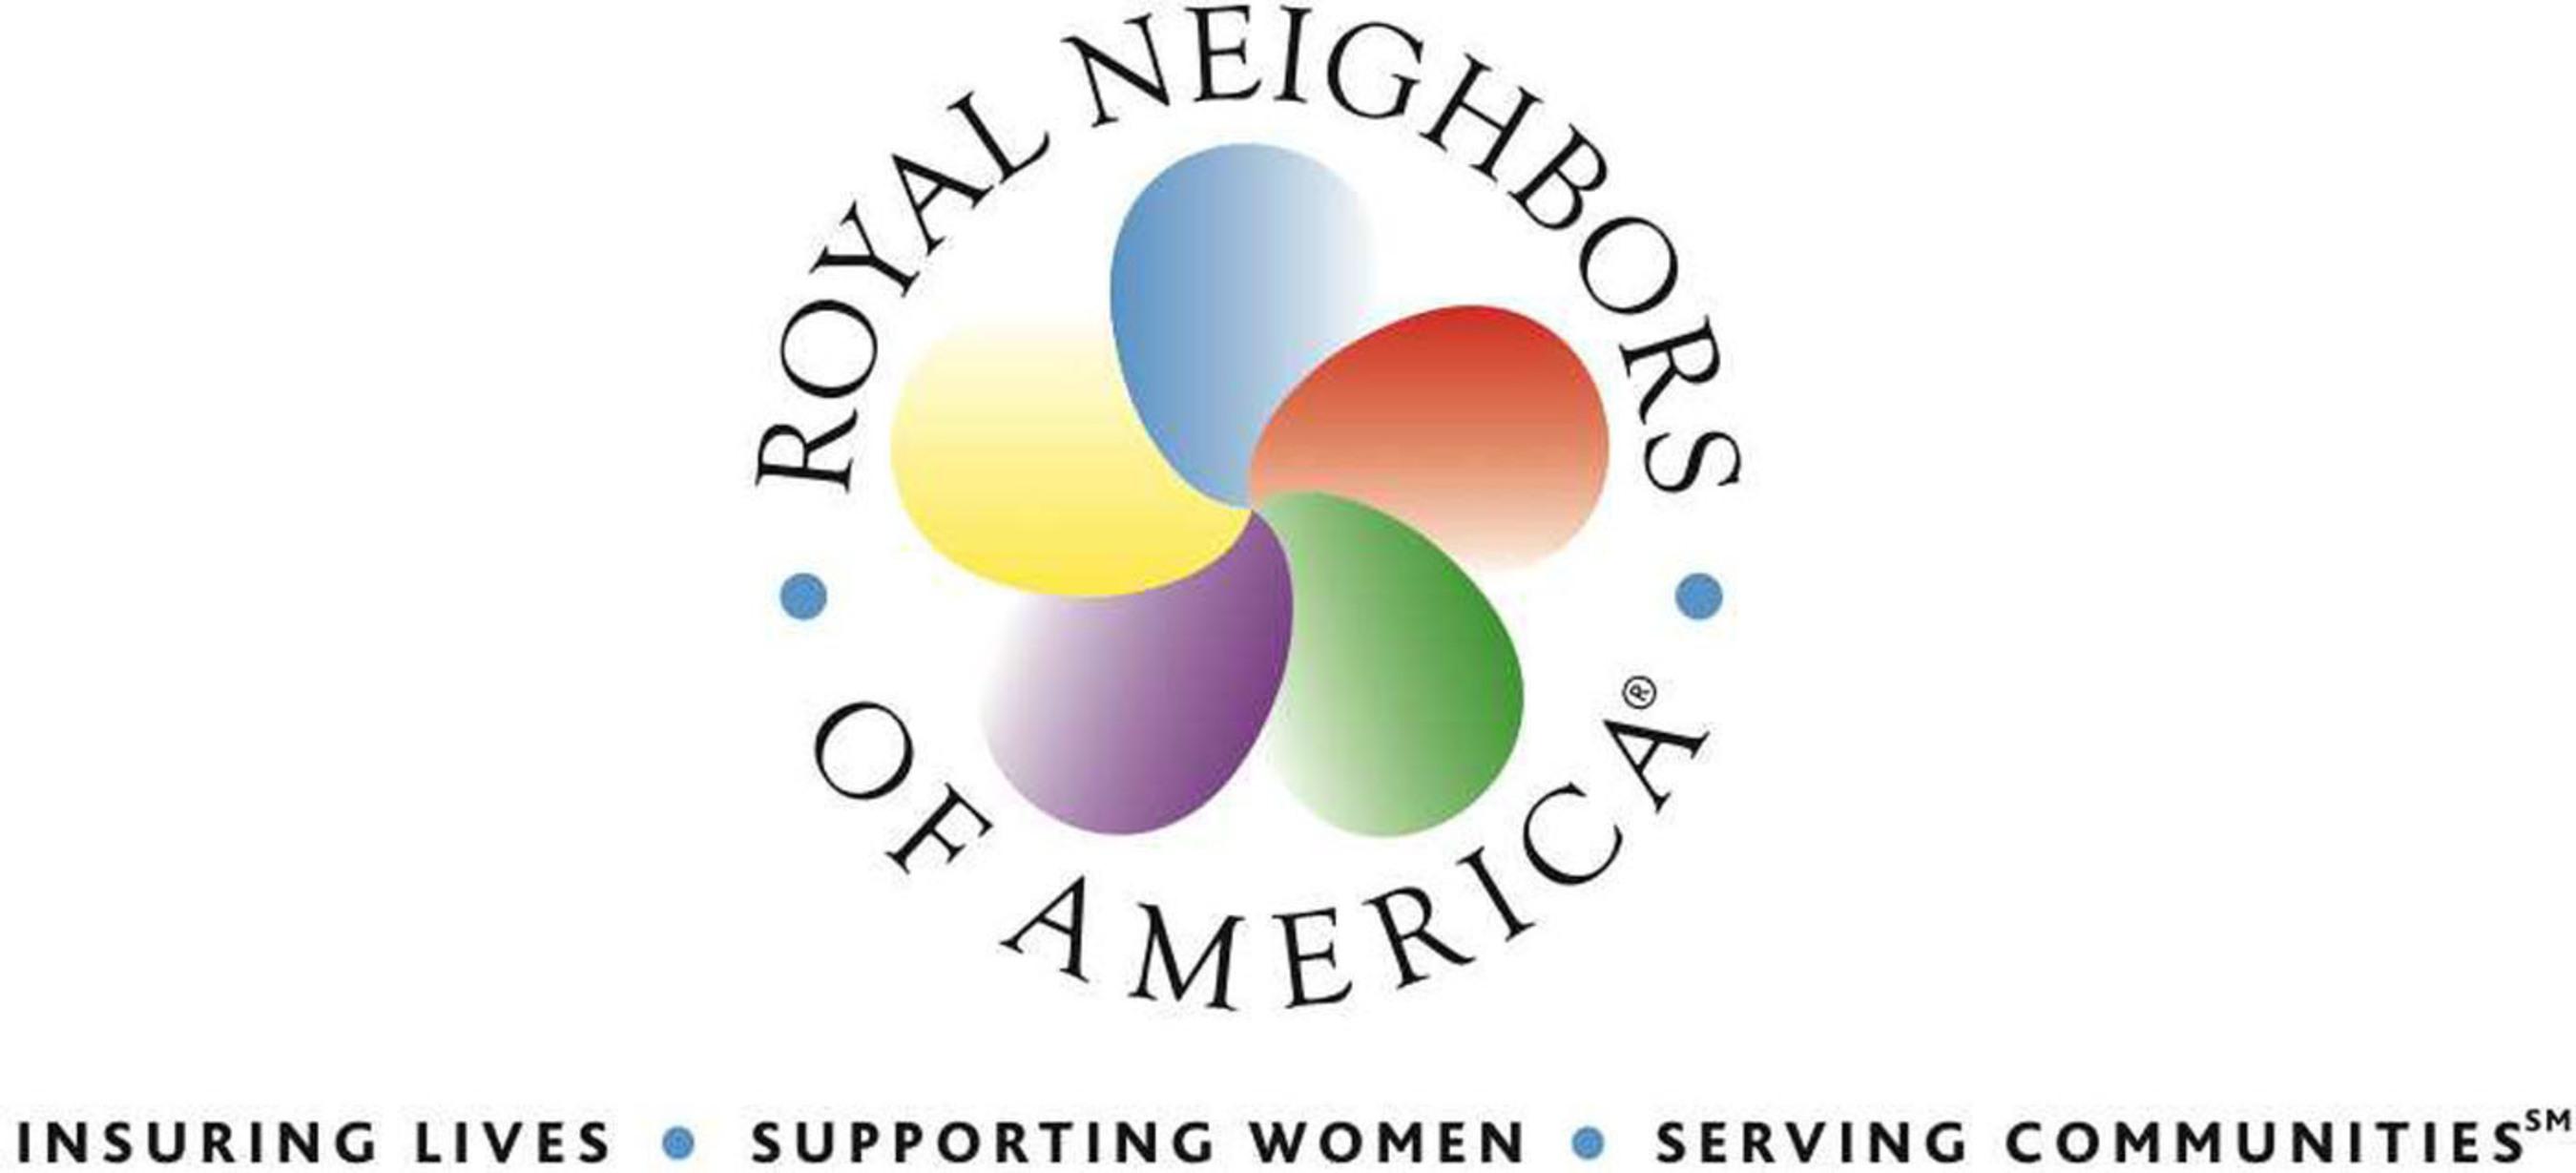 Royal Neighbors of America.